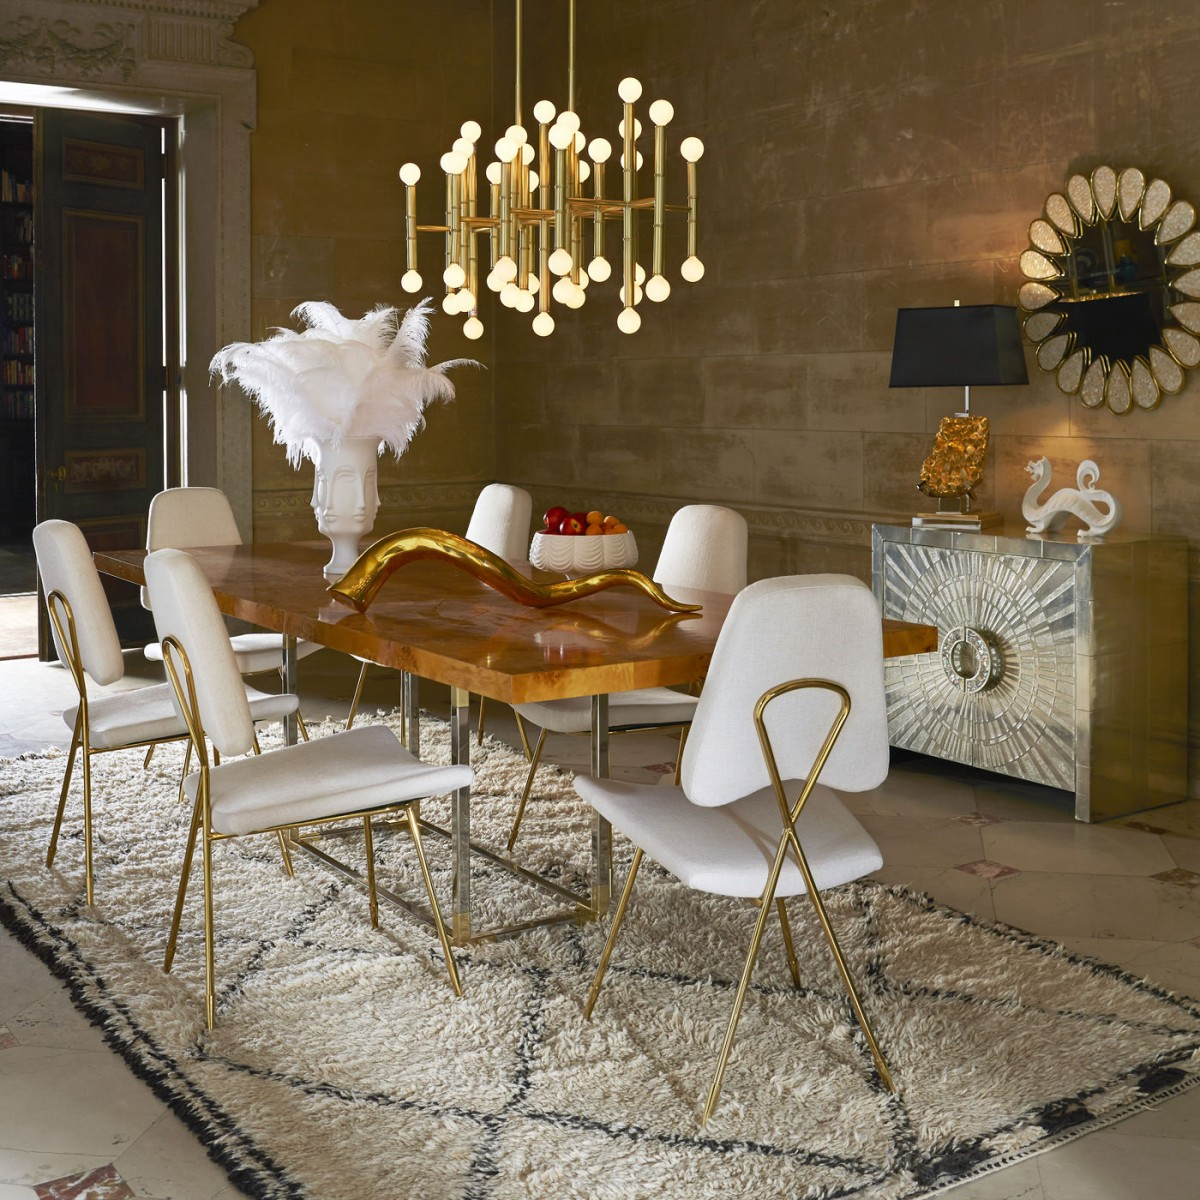 jonathan adler chair white slip covered dining room chairs designer focus king of happy chic